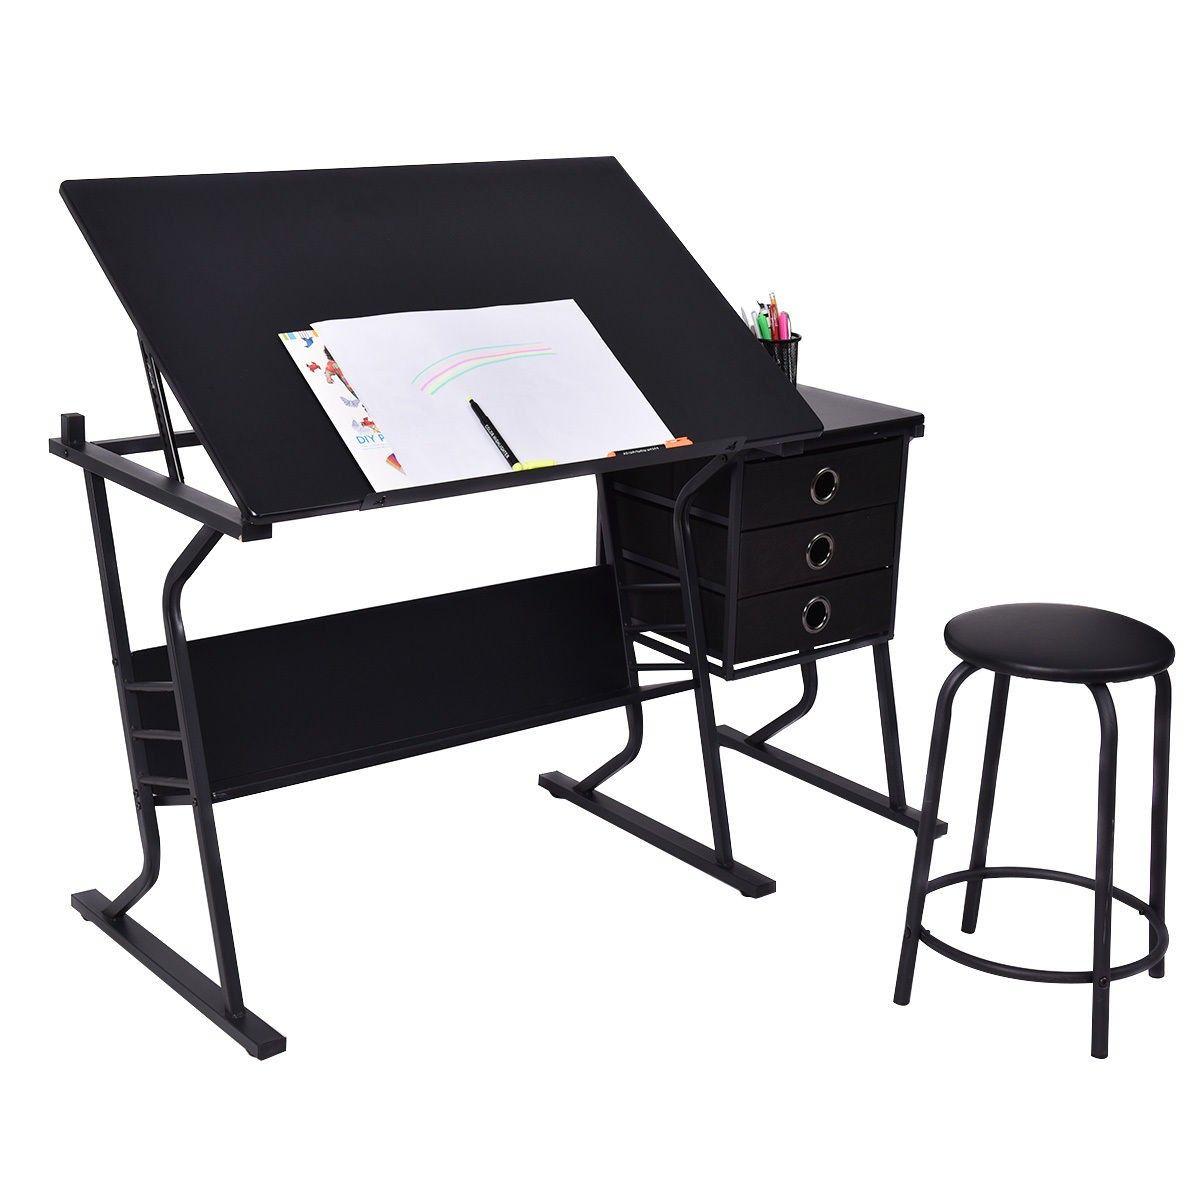 Prime Black Adjustable Drafting Table W Stool Side Drawers Download Free Architecture Designs Embacsunscenecom